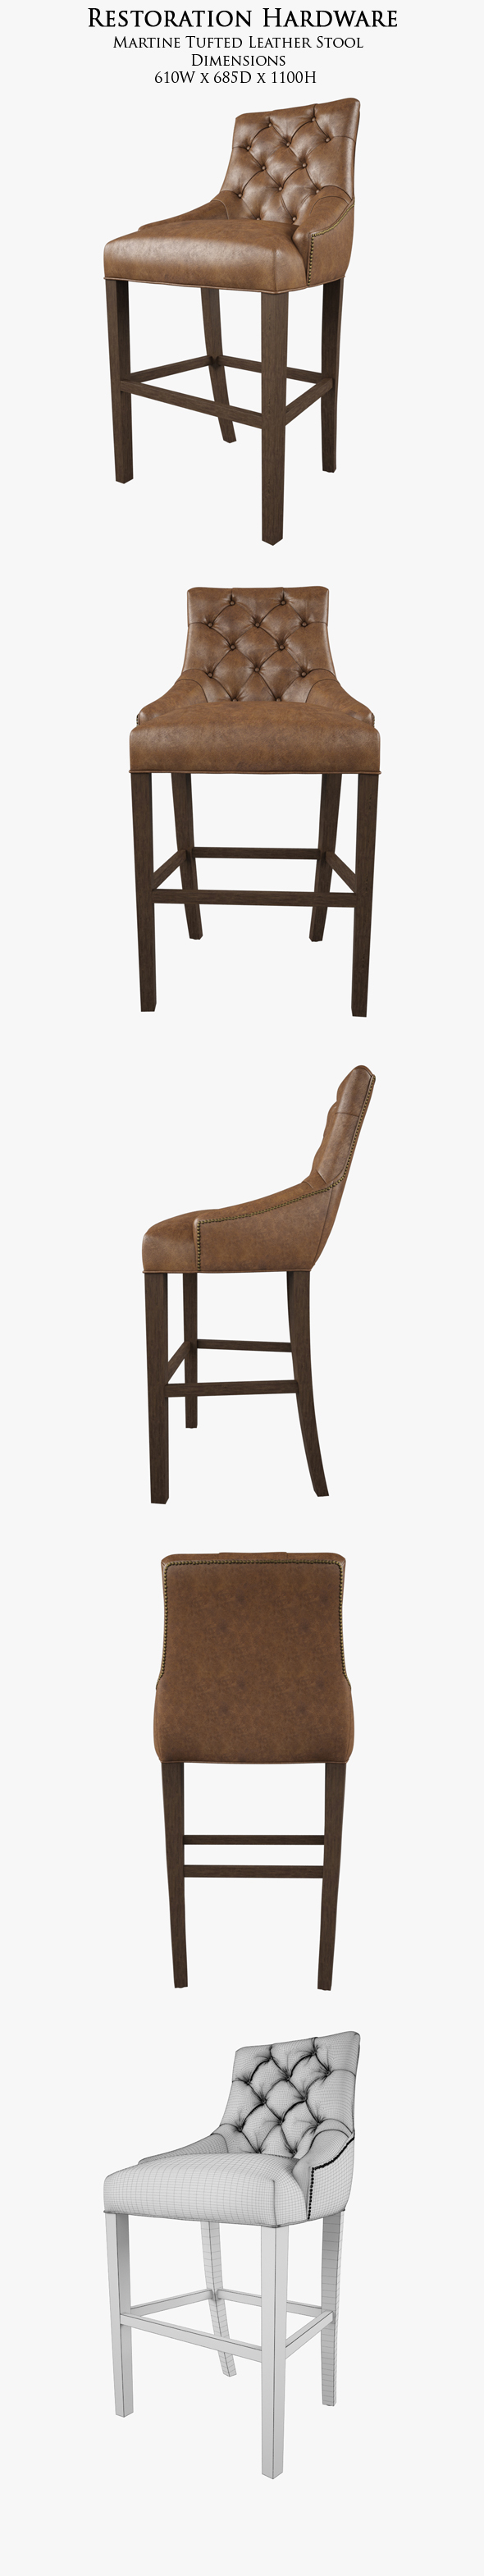 Restoration Hardware /Martine Tufted Leather Stool - 3DOcean Item for Sale